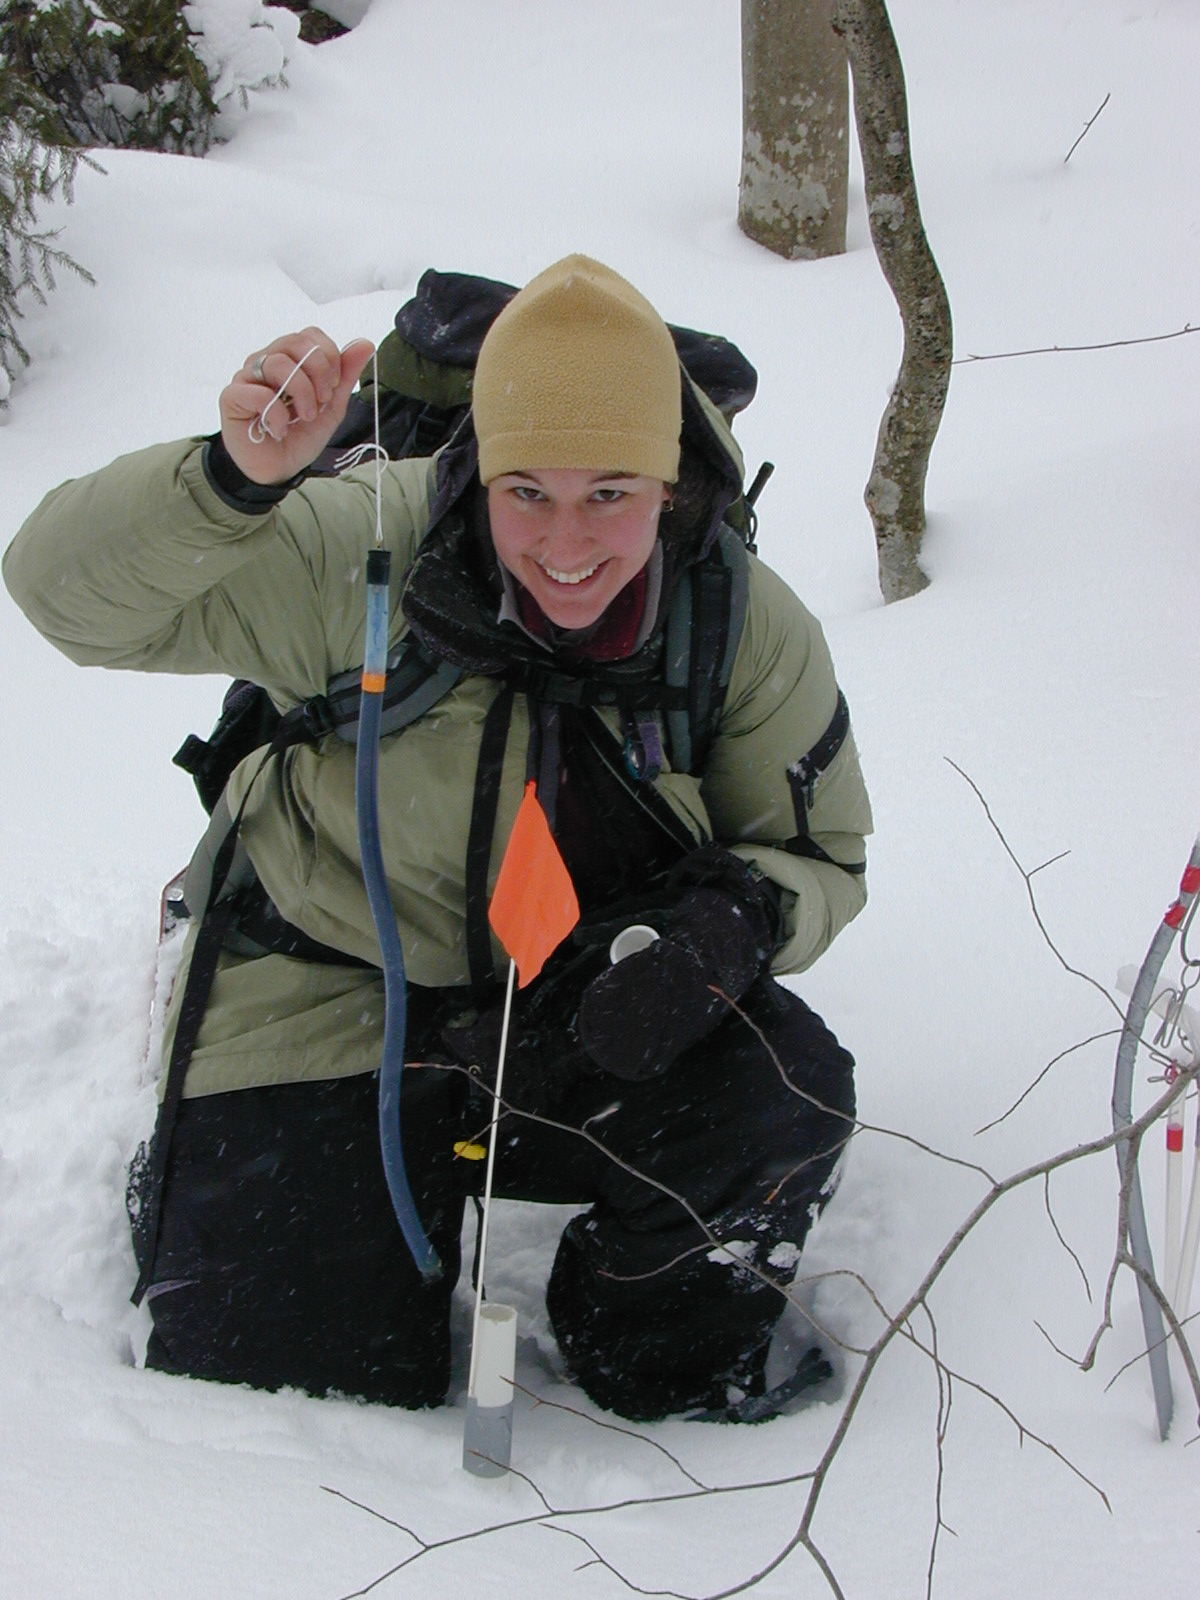 Lisa Kurian, MS 2009